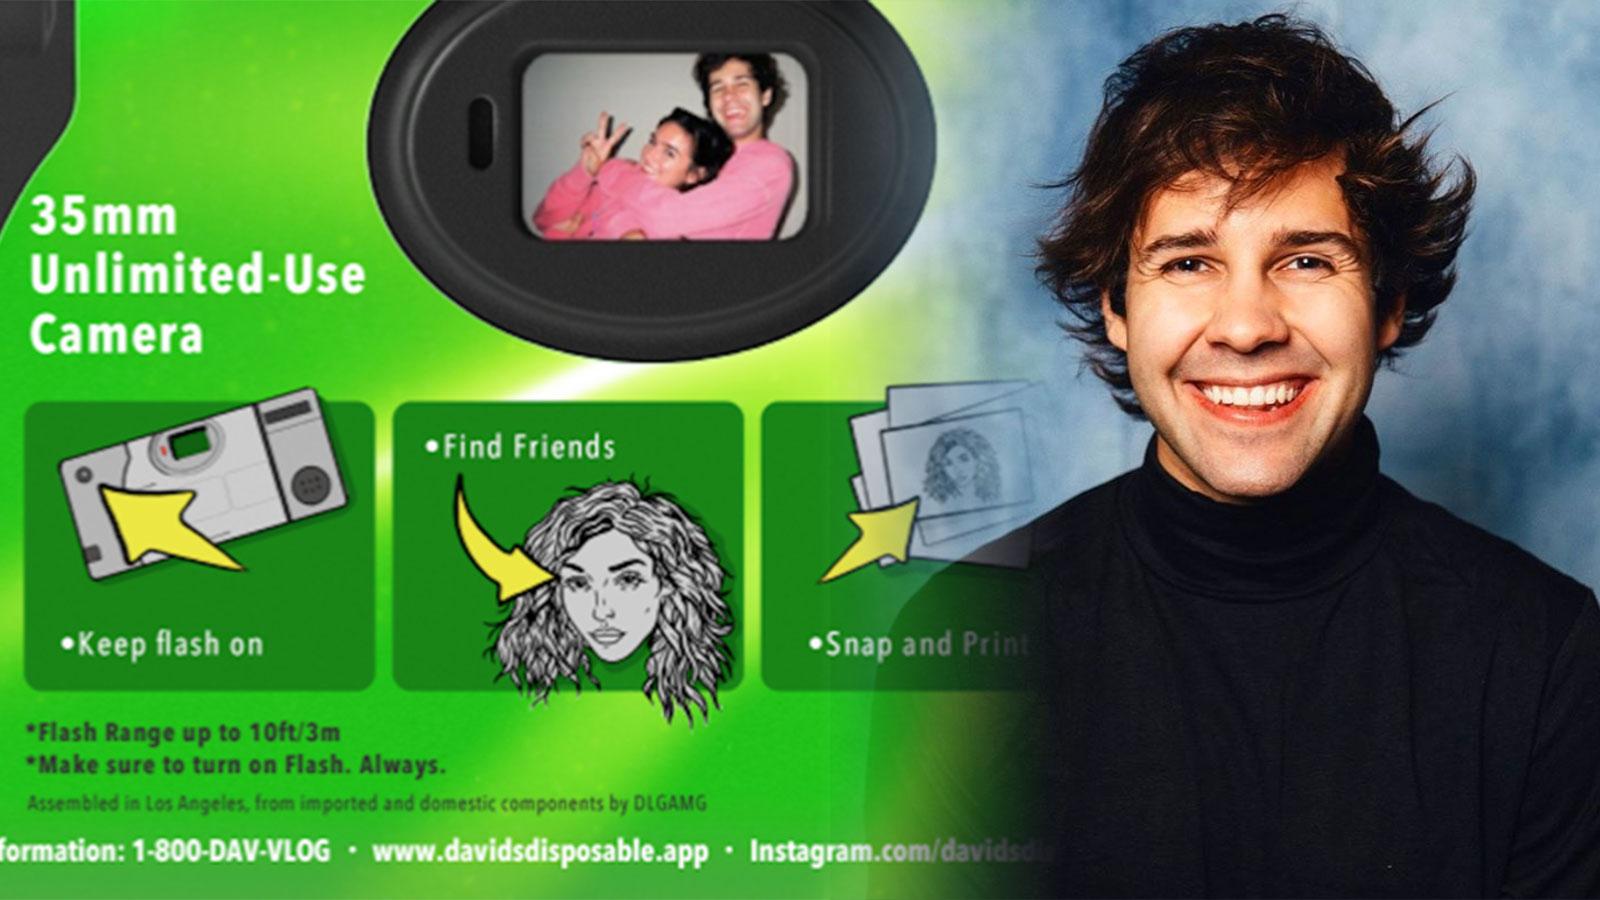 TikToker claims David Dobrik stole his designs for Dispo app - Dexerto